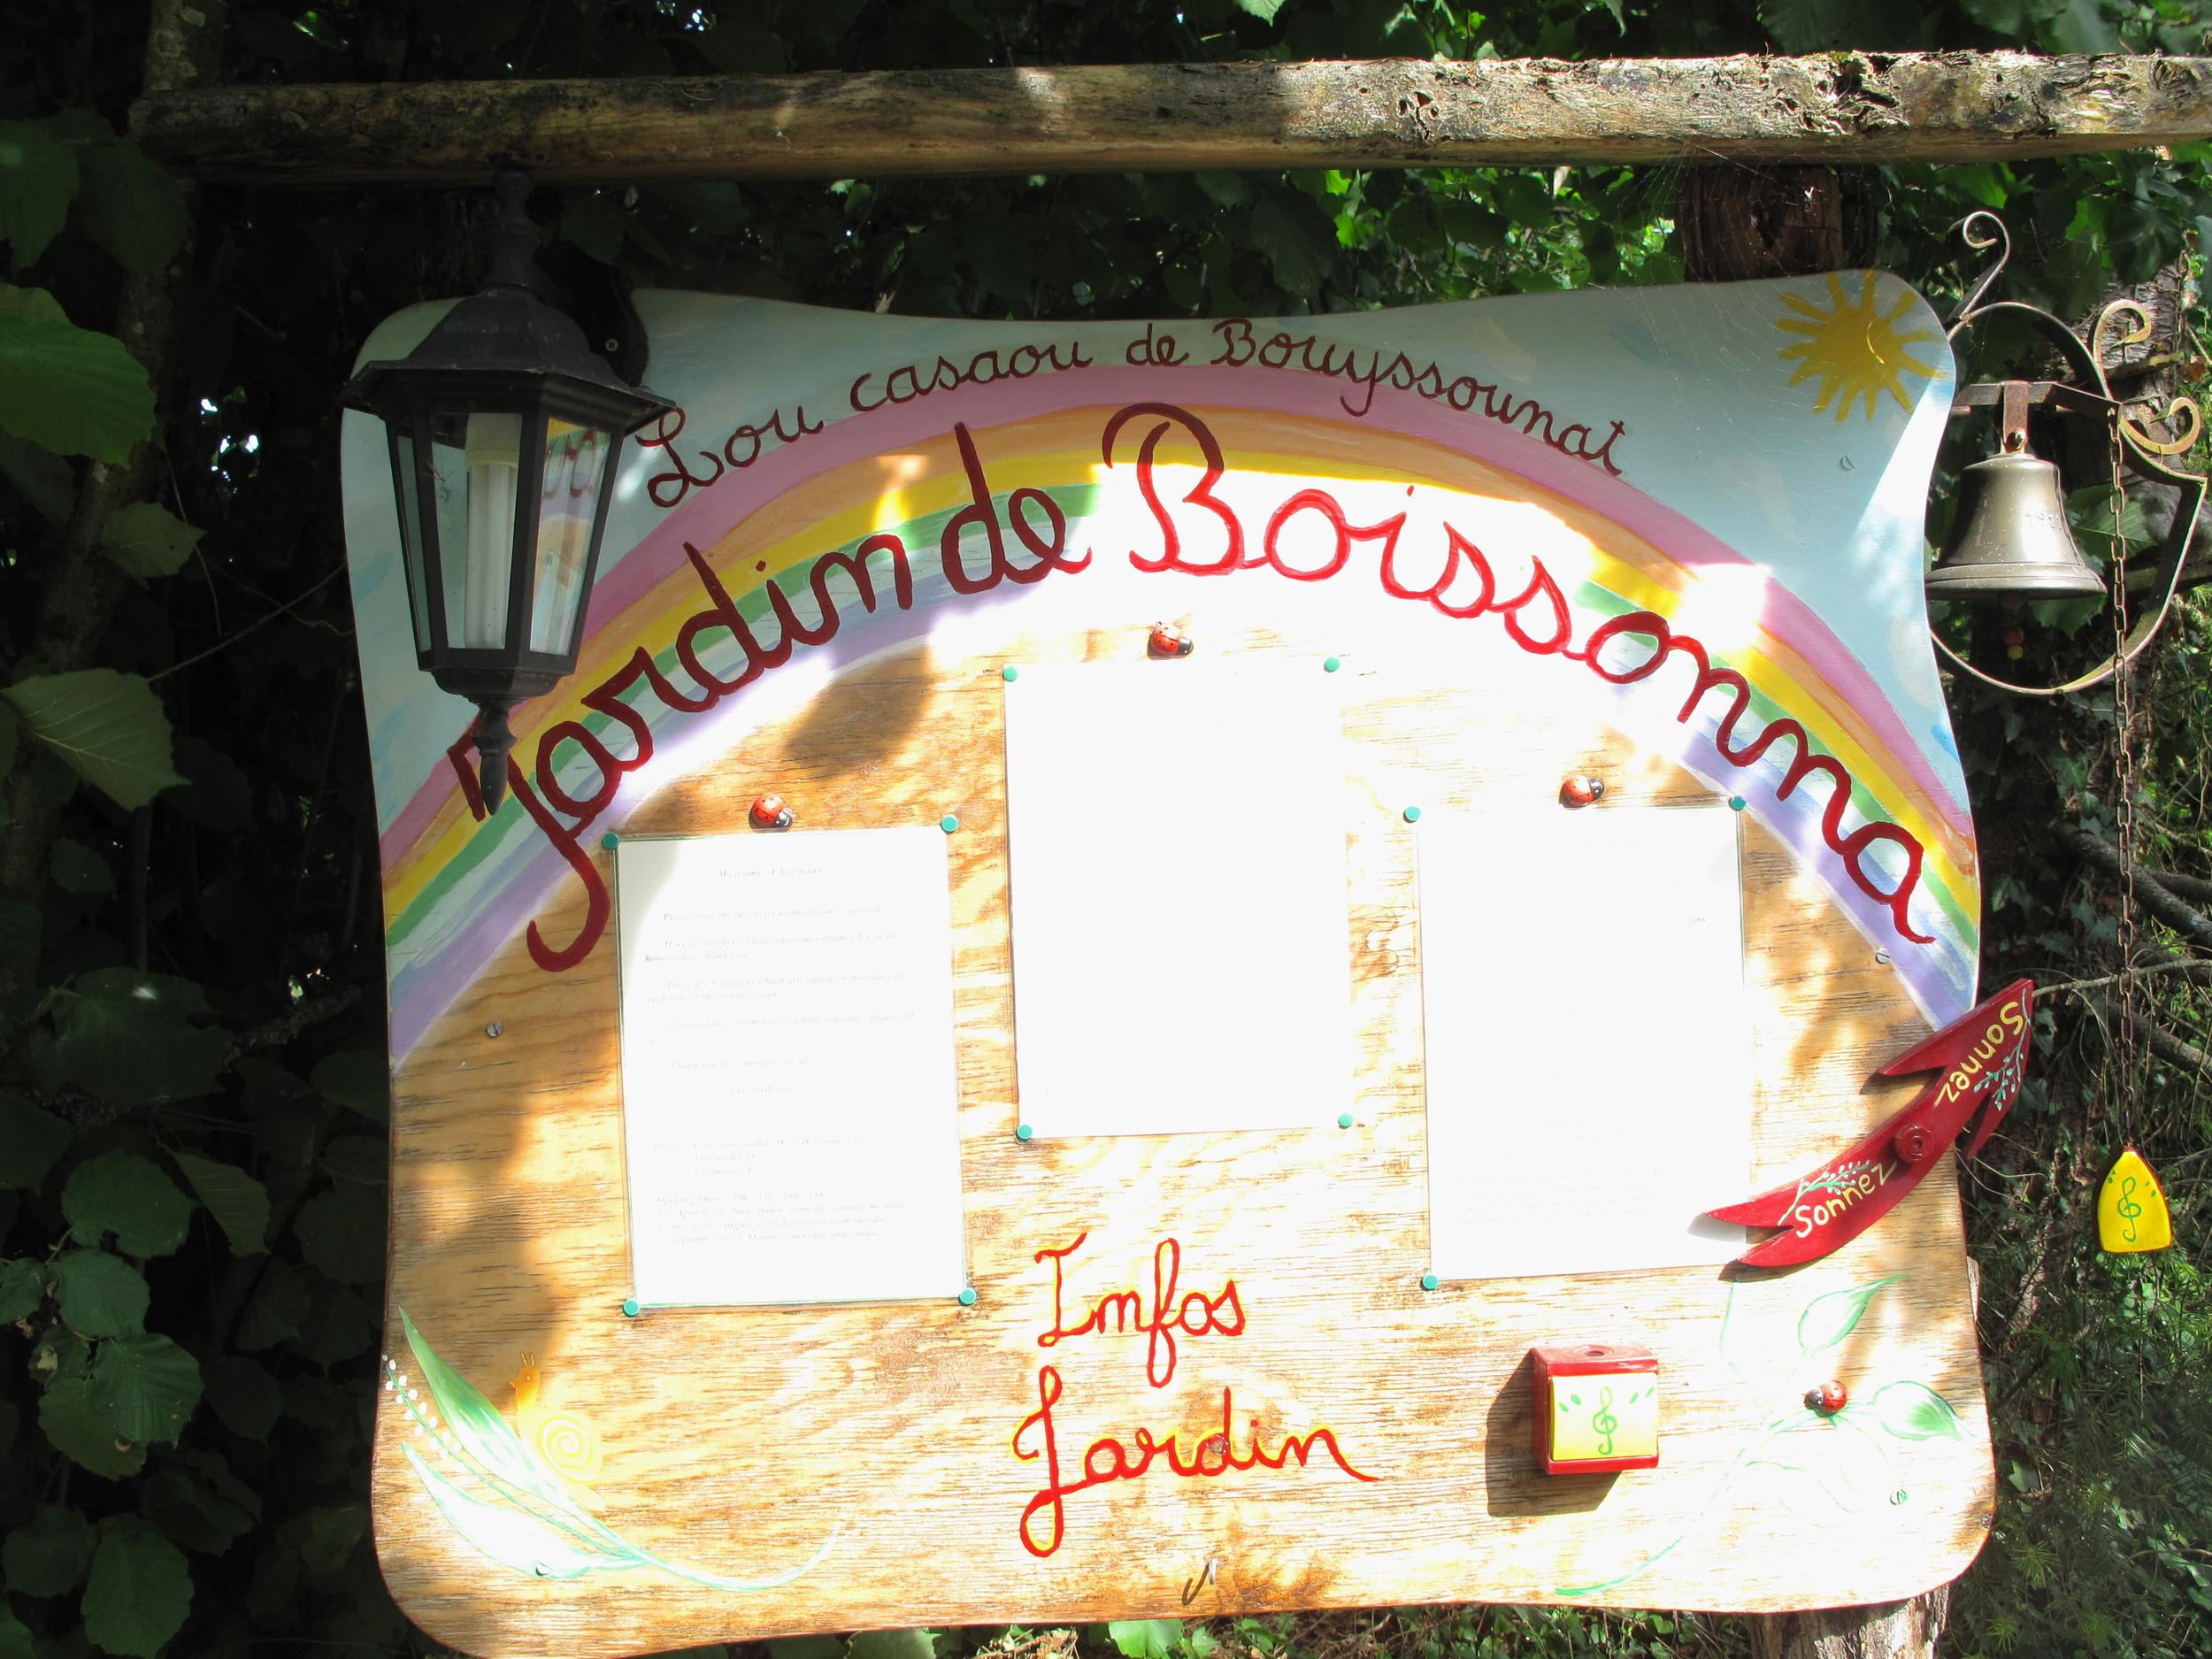 Sign for the Jardin de Boissonna - a notable garden in Bordeaux,France